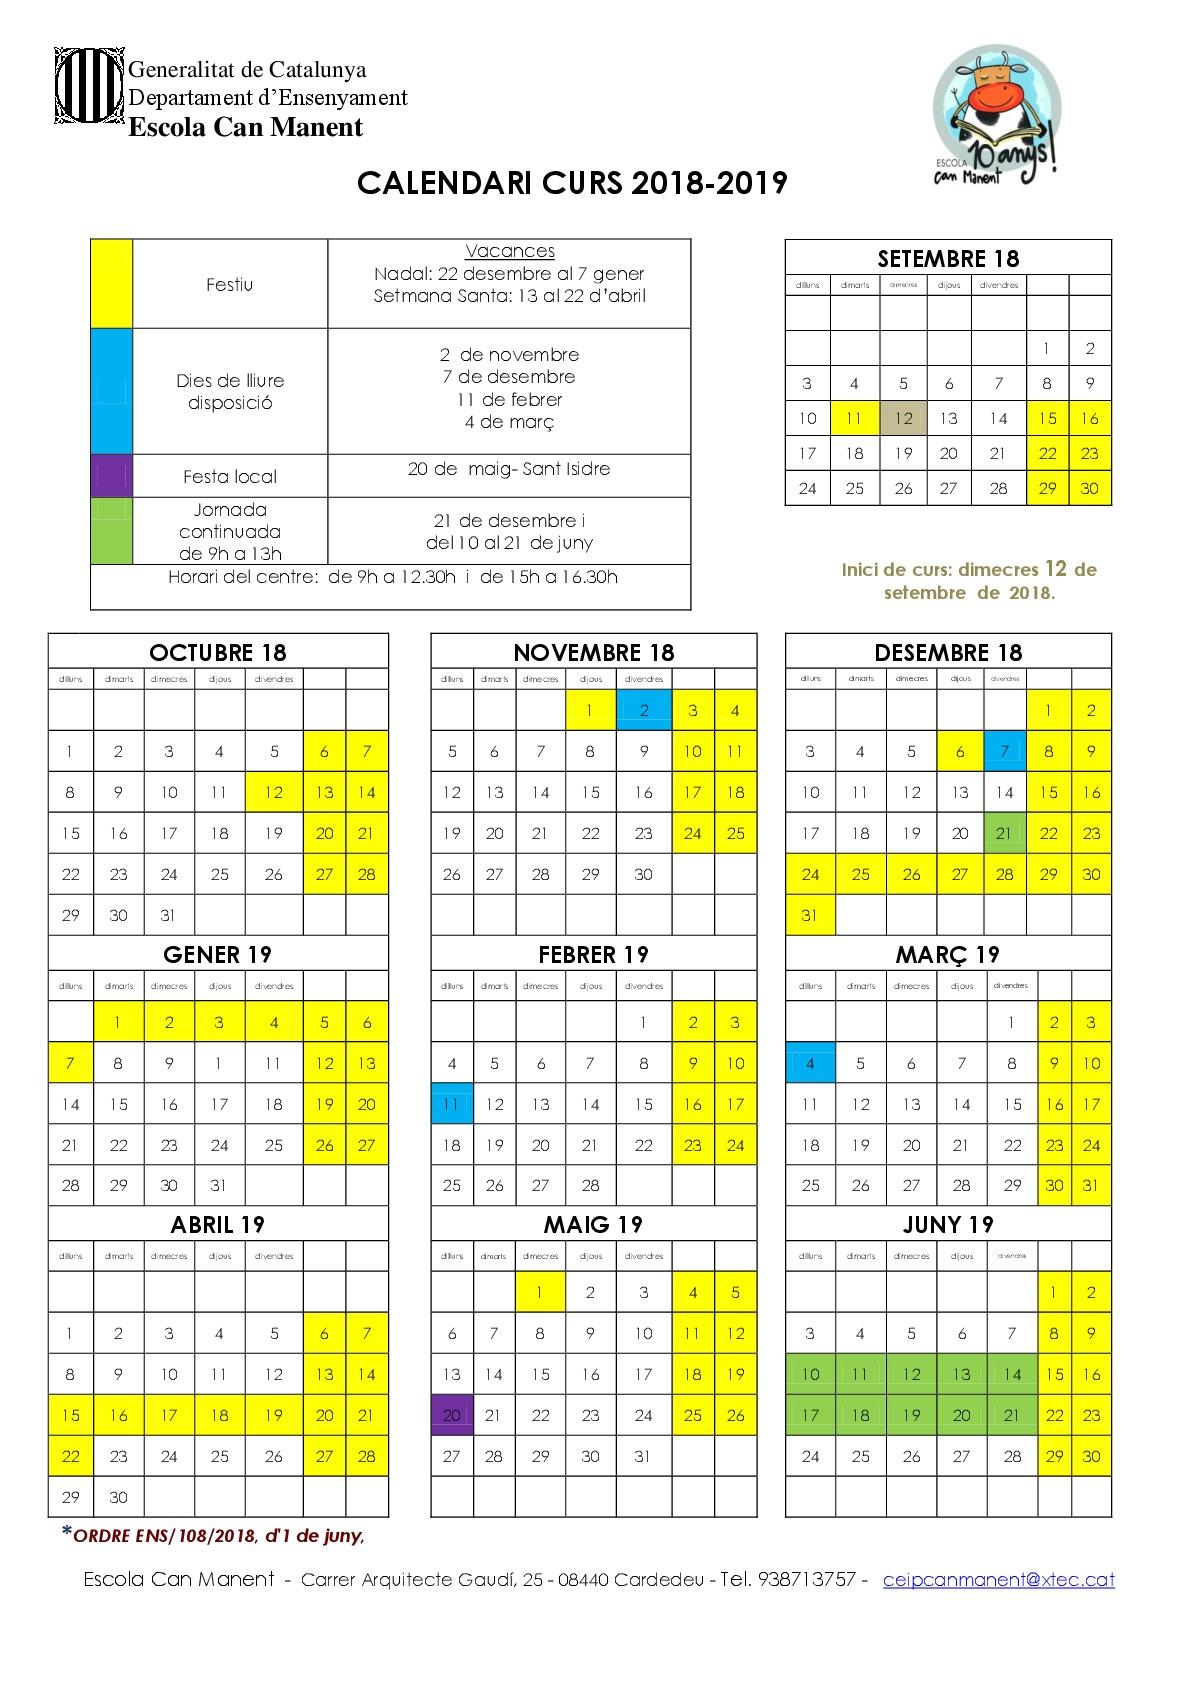 Calendari escolar 18-19 DEFINITIU